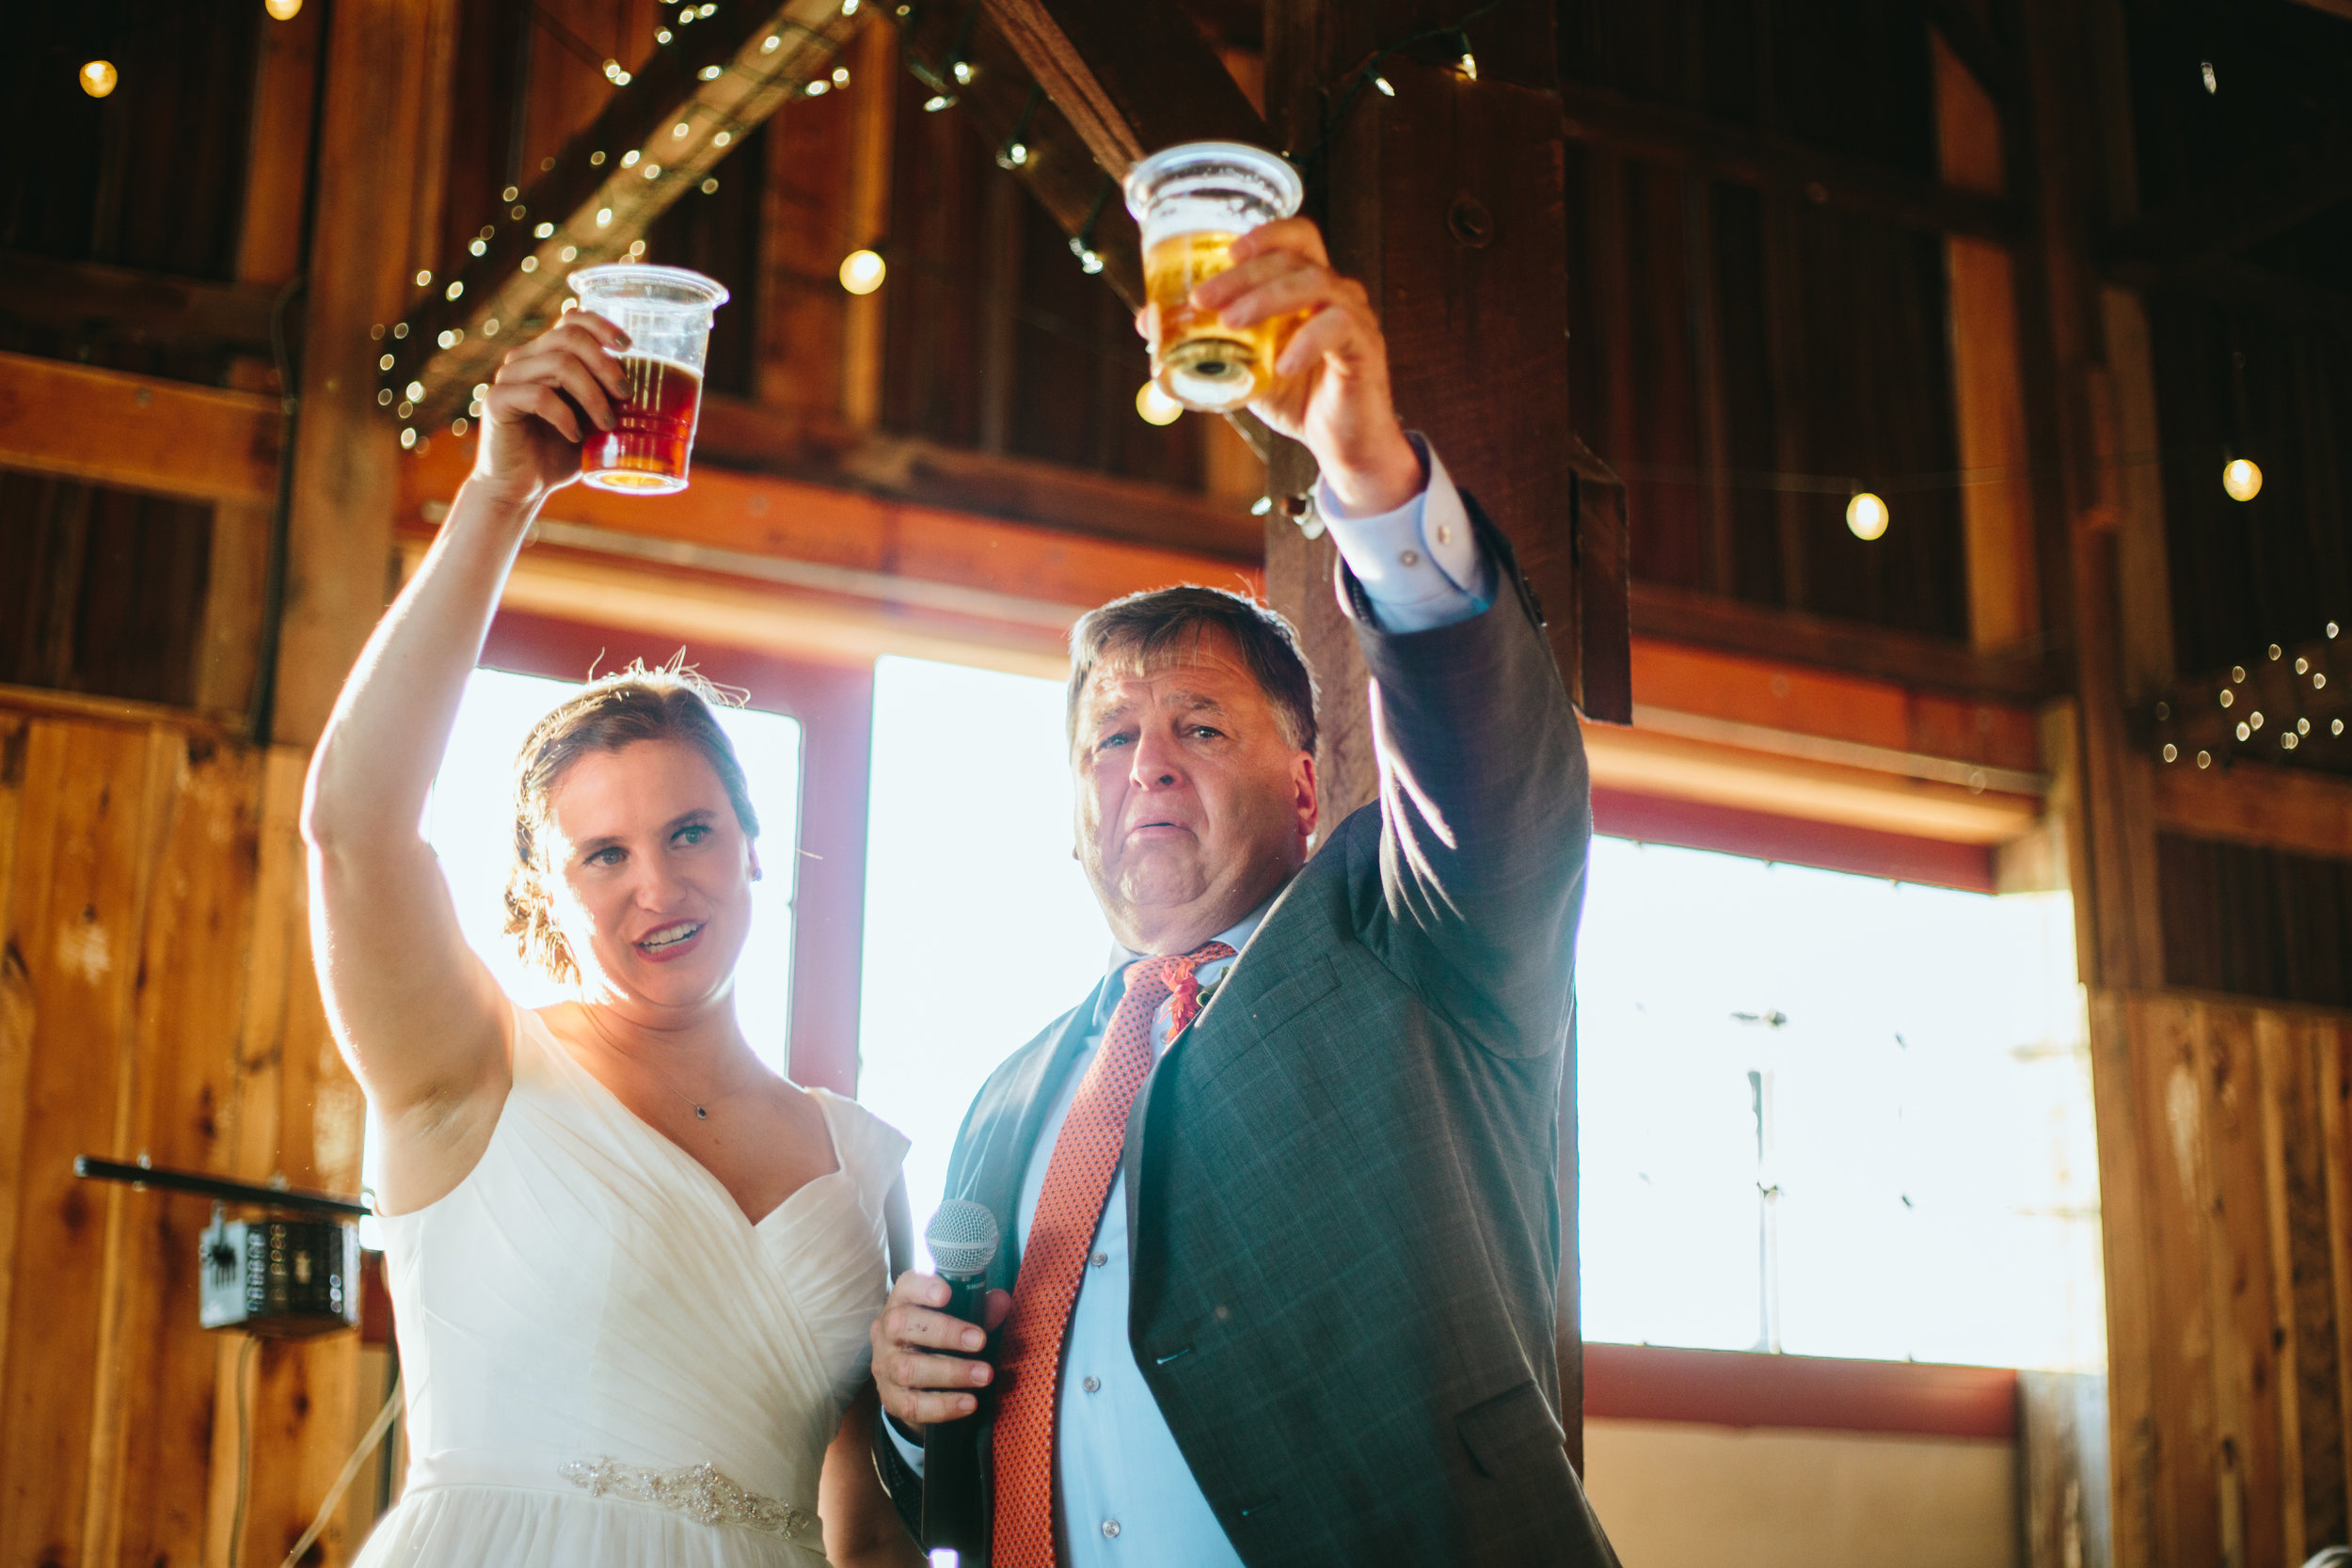 Whitesell-Mattioda Wedding-806.jpg